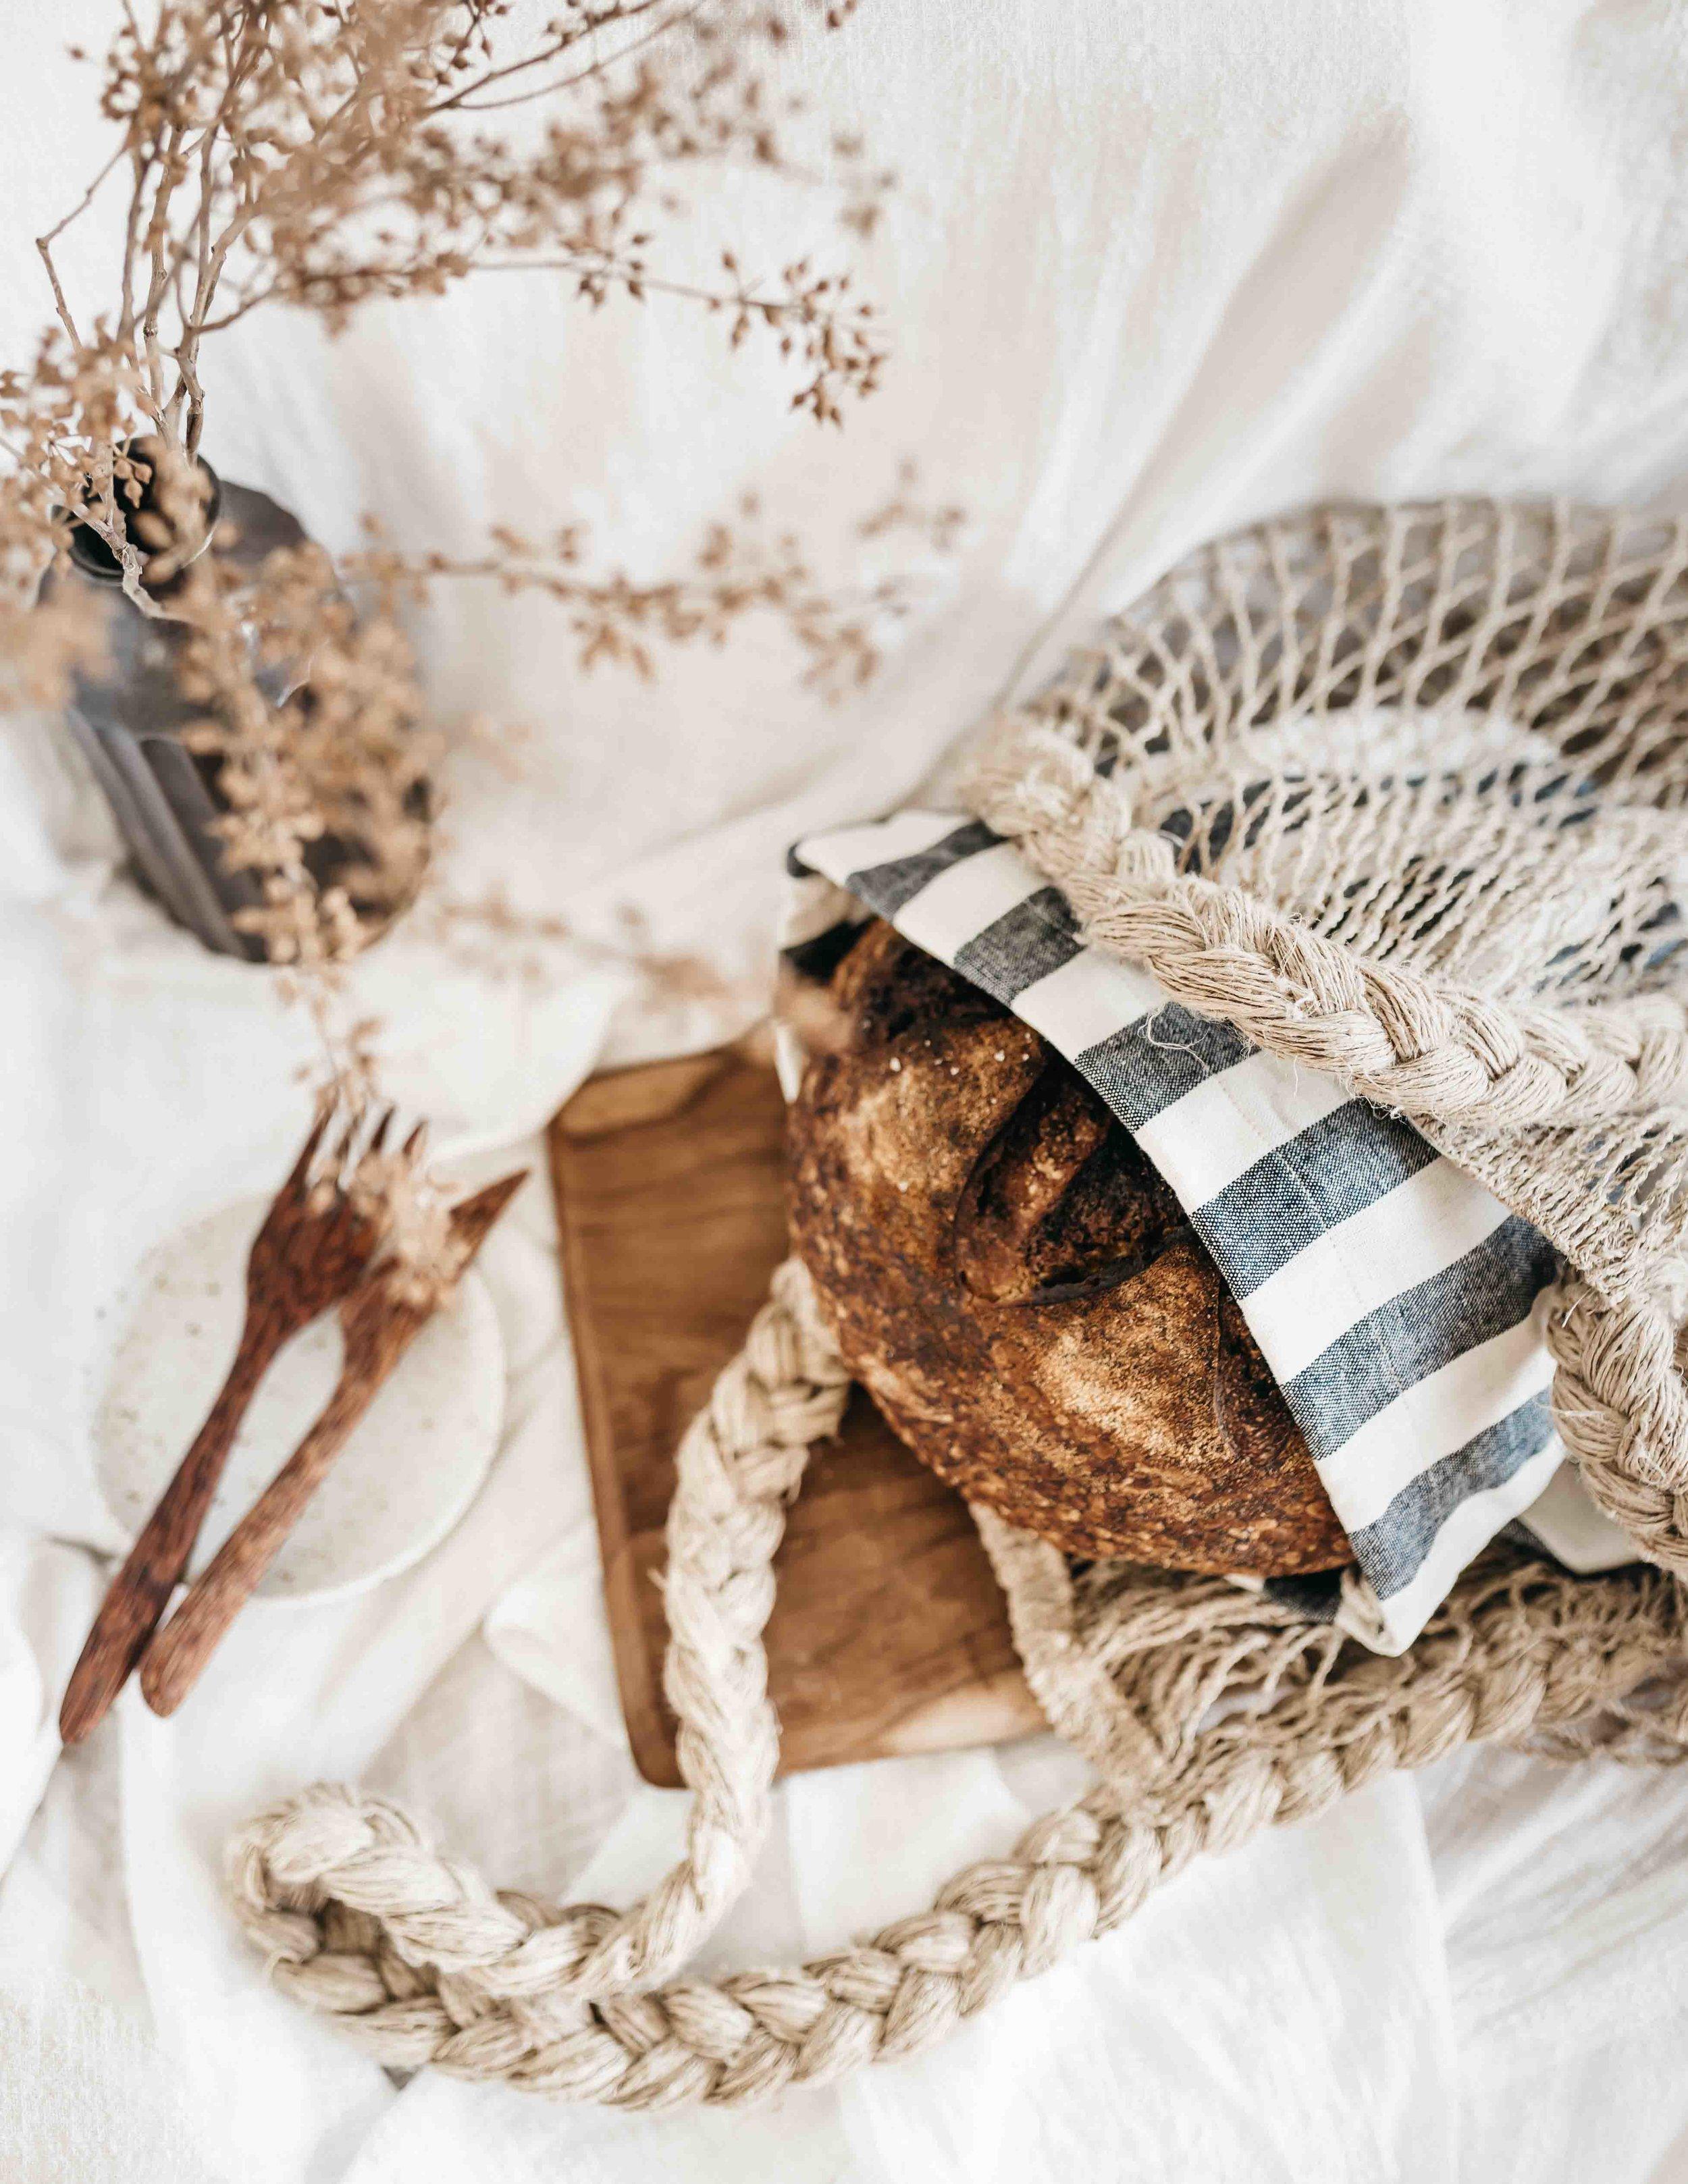 keira-mason-nowhere-and-everywhere-bread-bag-cotton.jpg